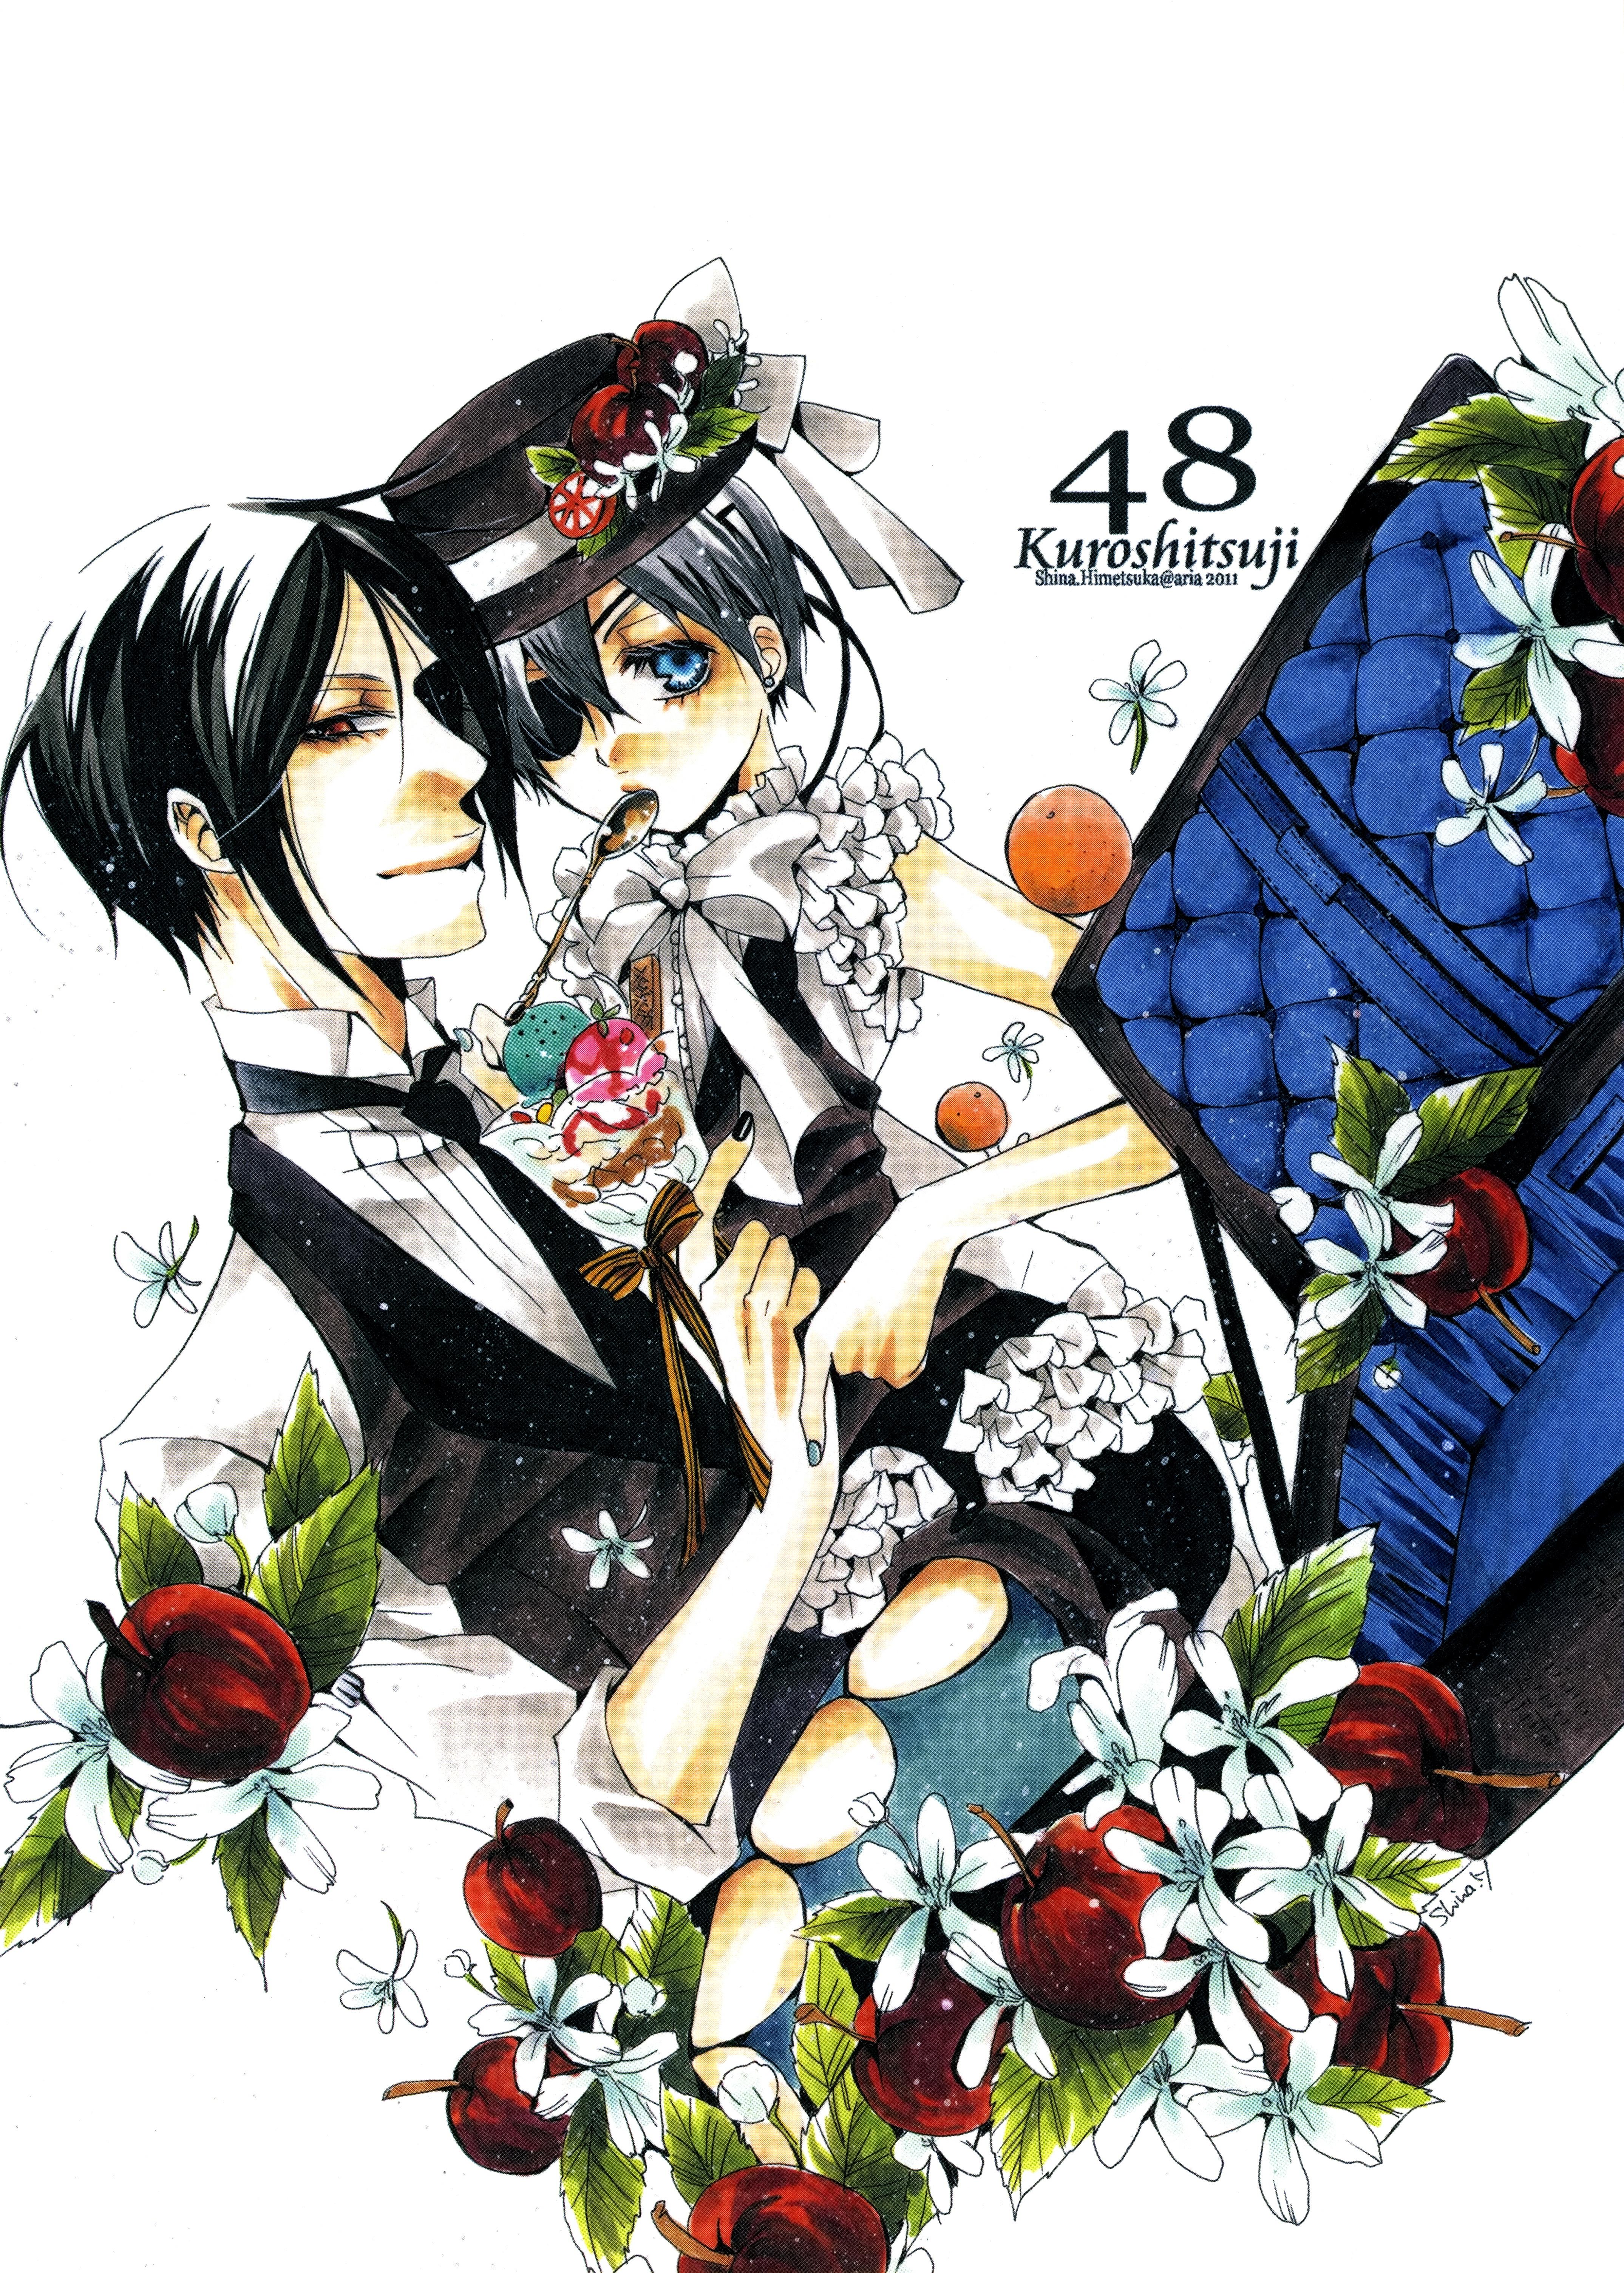 Kuroshitsuji black butler toboso yana mobile wallpaper 1241656 zerochan anime image board - Mobel michaelis ...